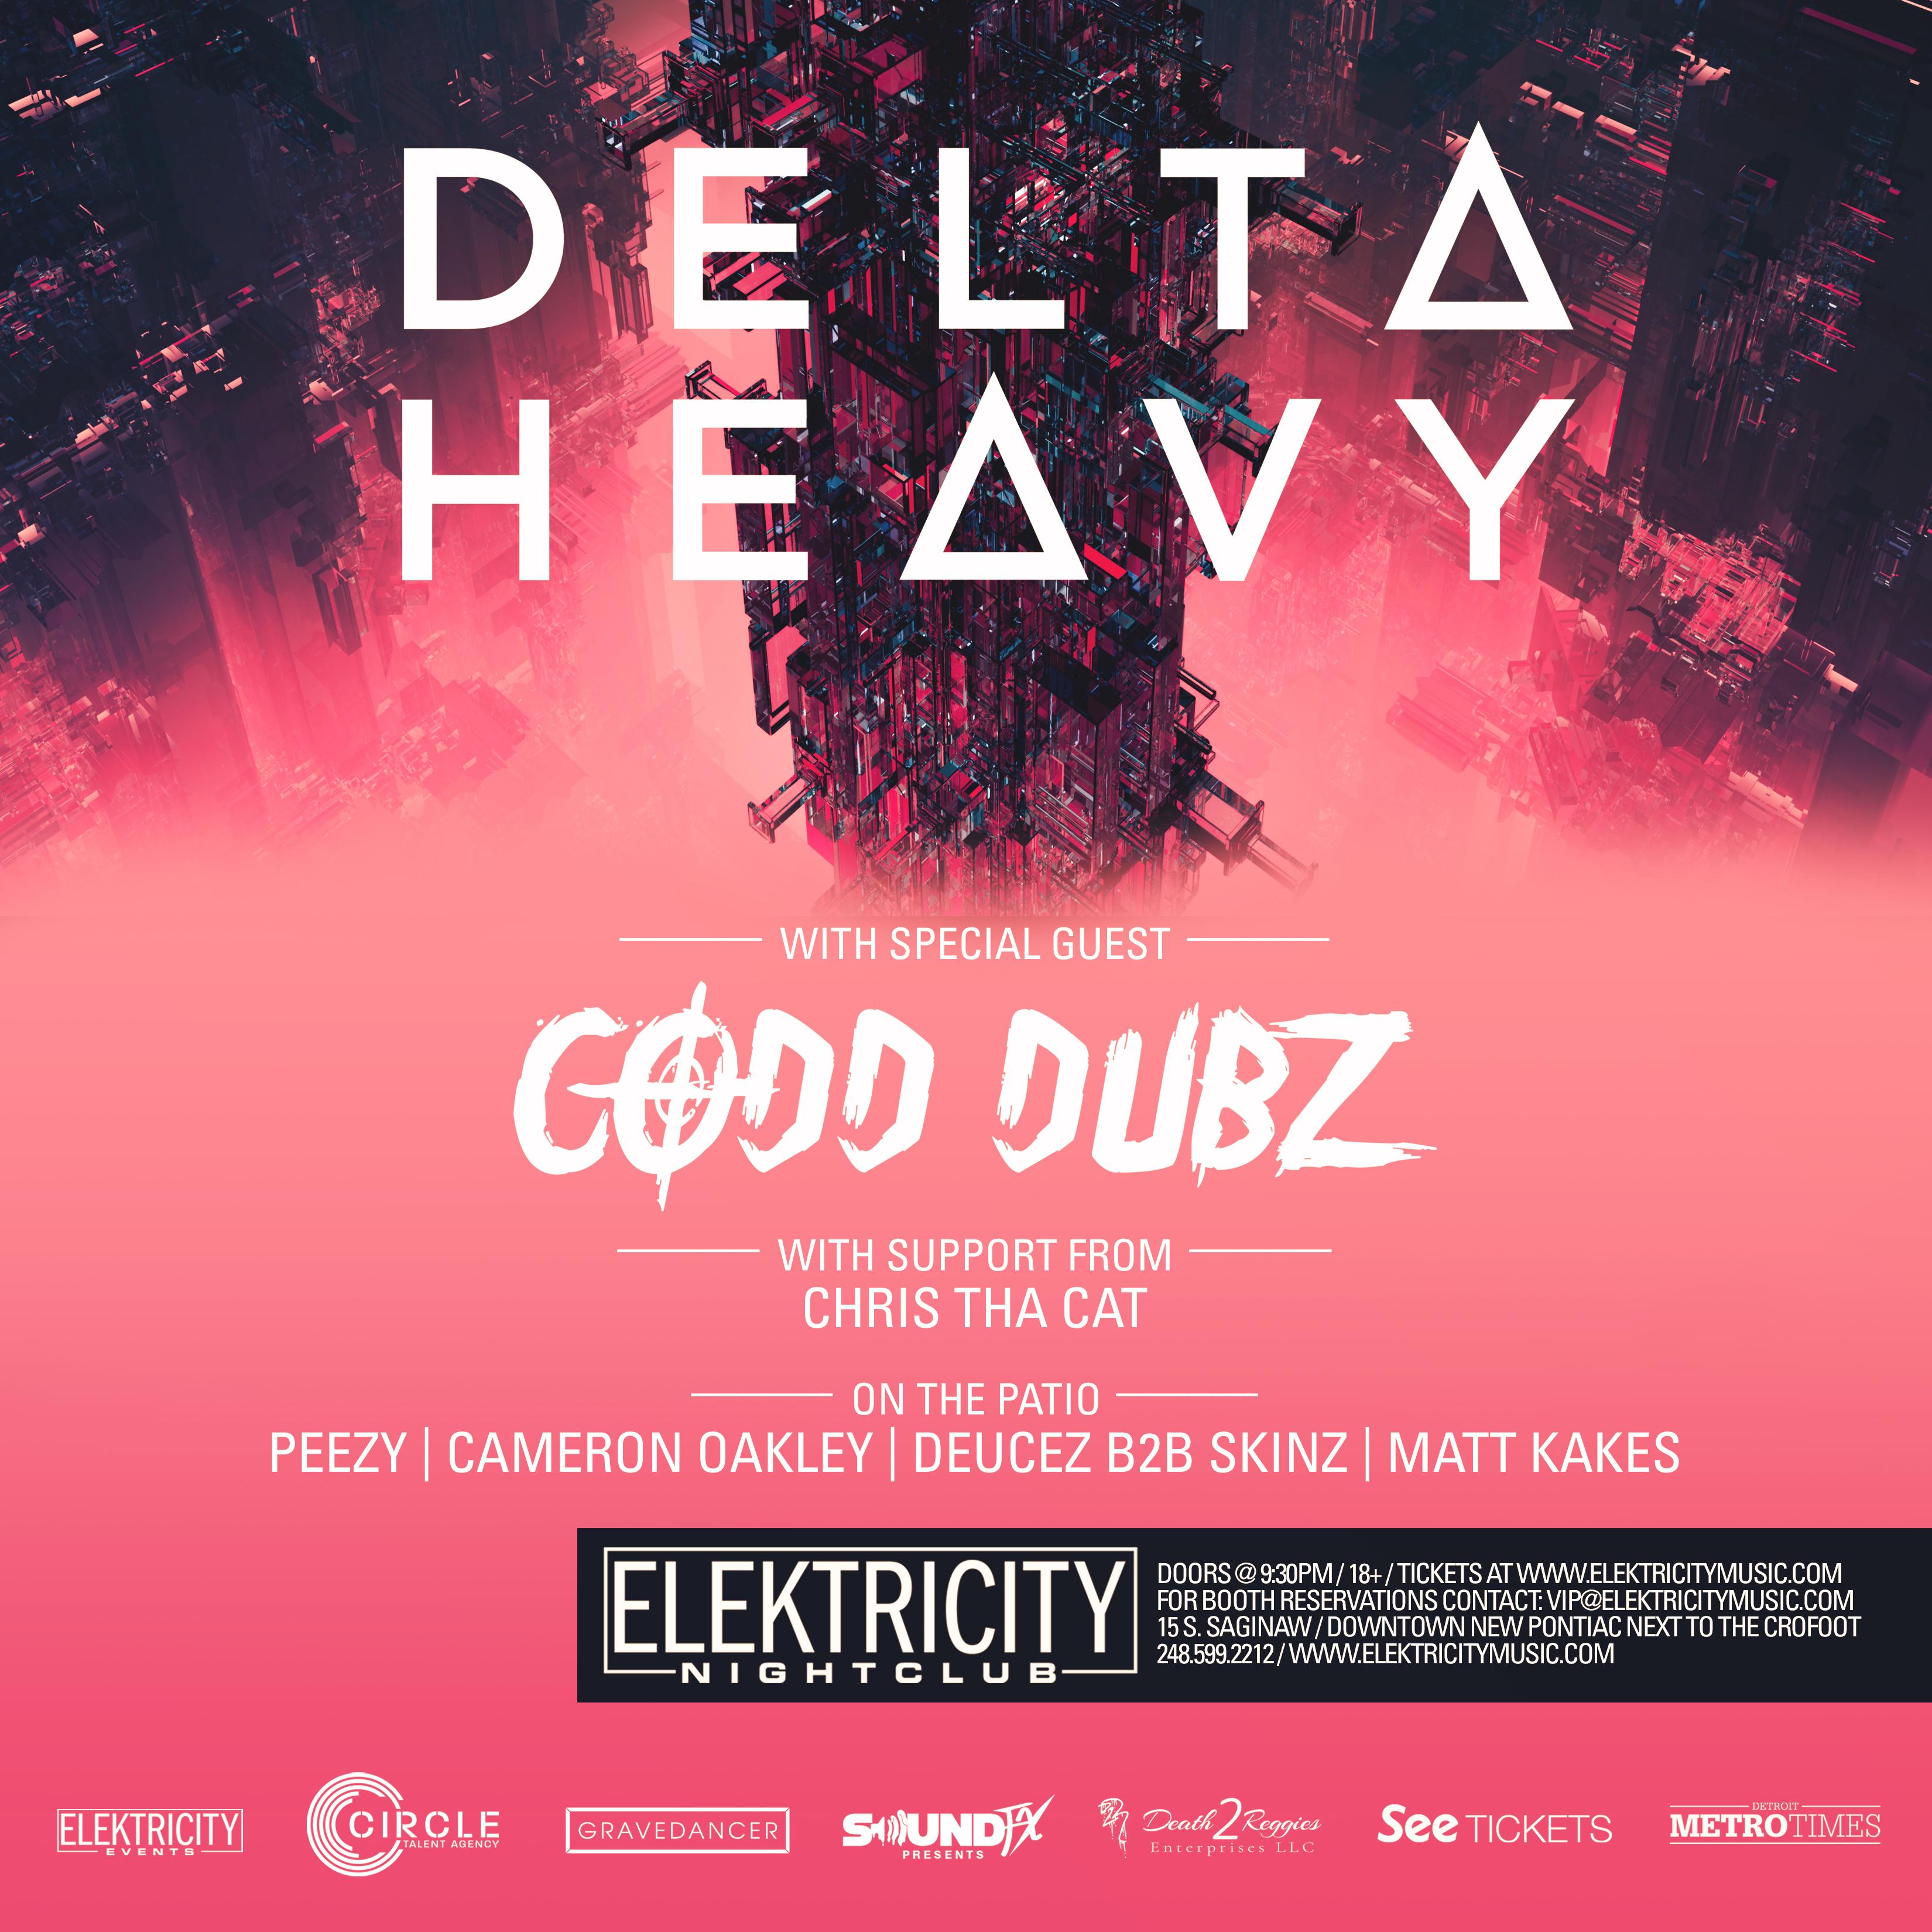 Delta Heavy + Codd Dubz At Elektricity   Friday, Feb 23   Guestlist,  Tickets, And Bottle Service | Discotech